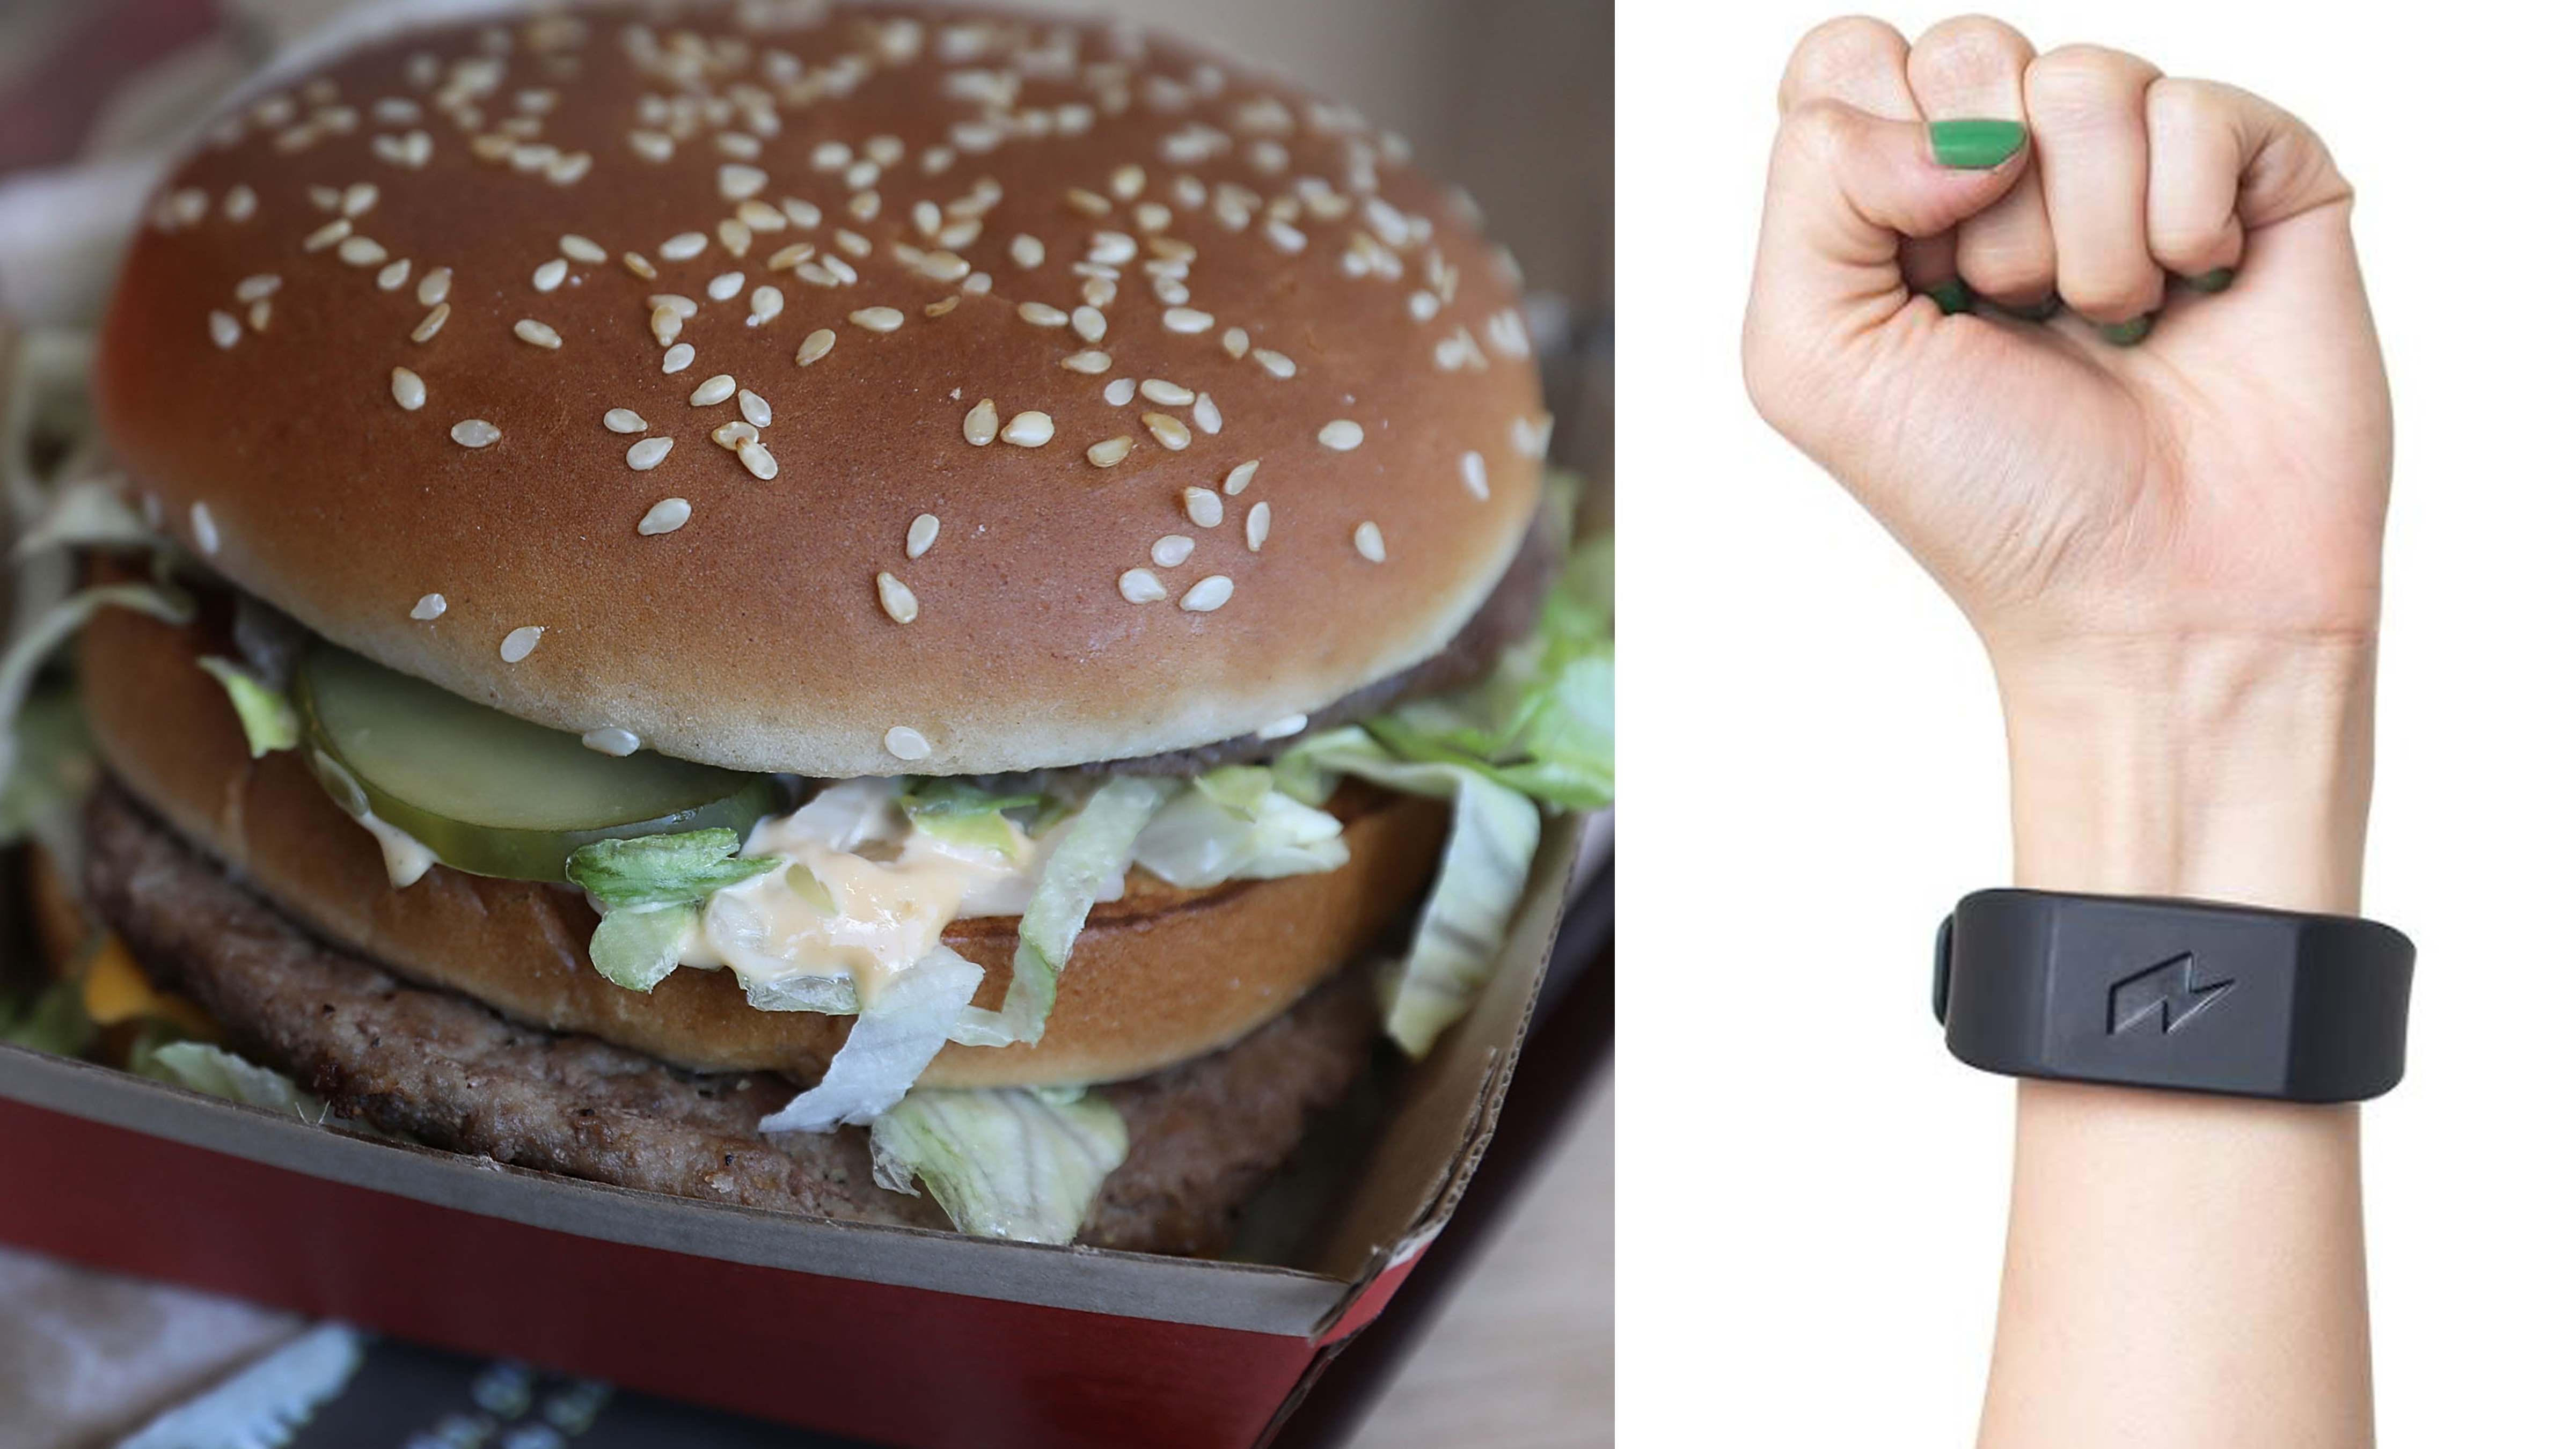 Pavlok wristband sends shock to help prevent bad habits